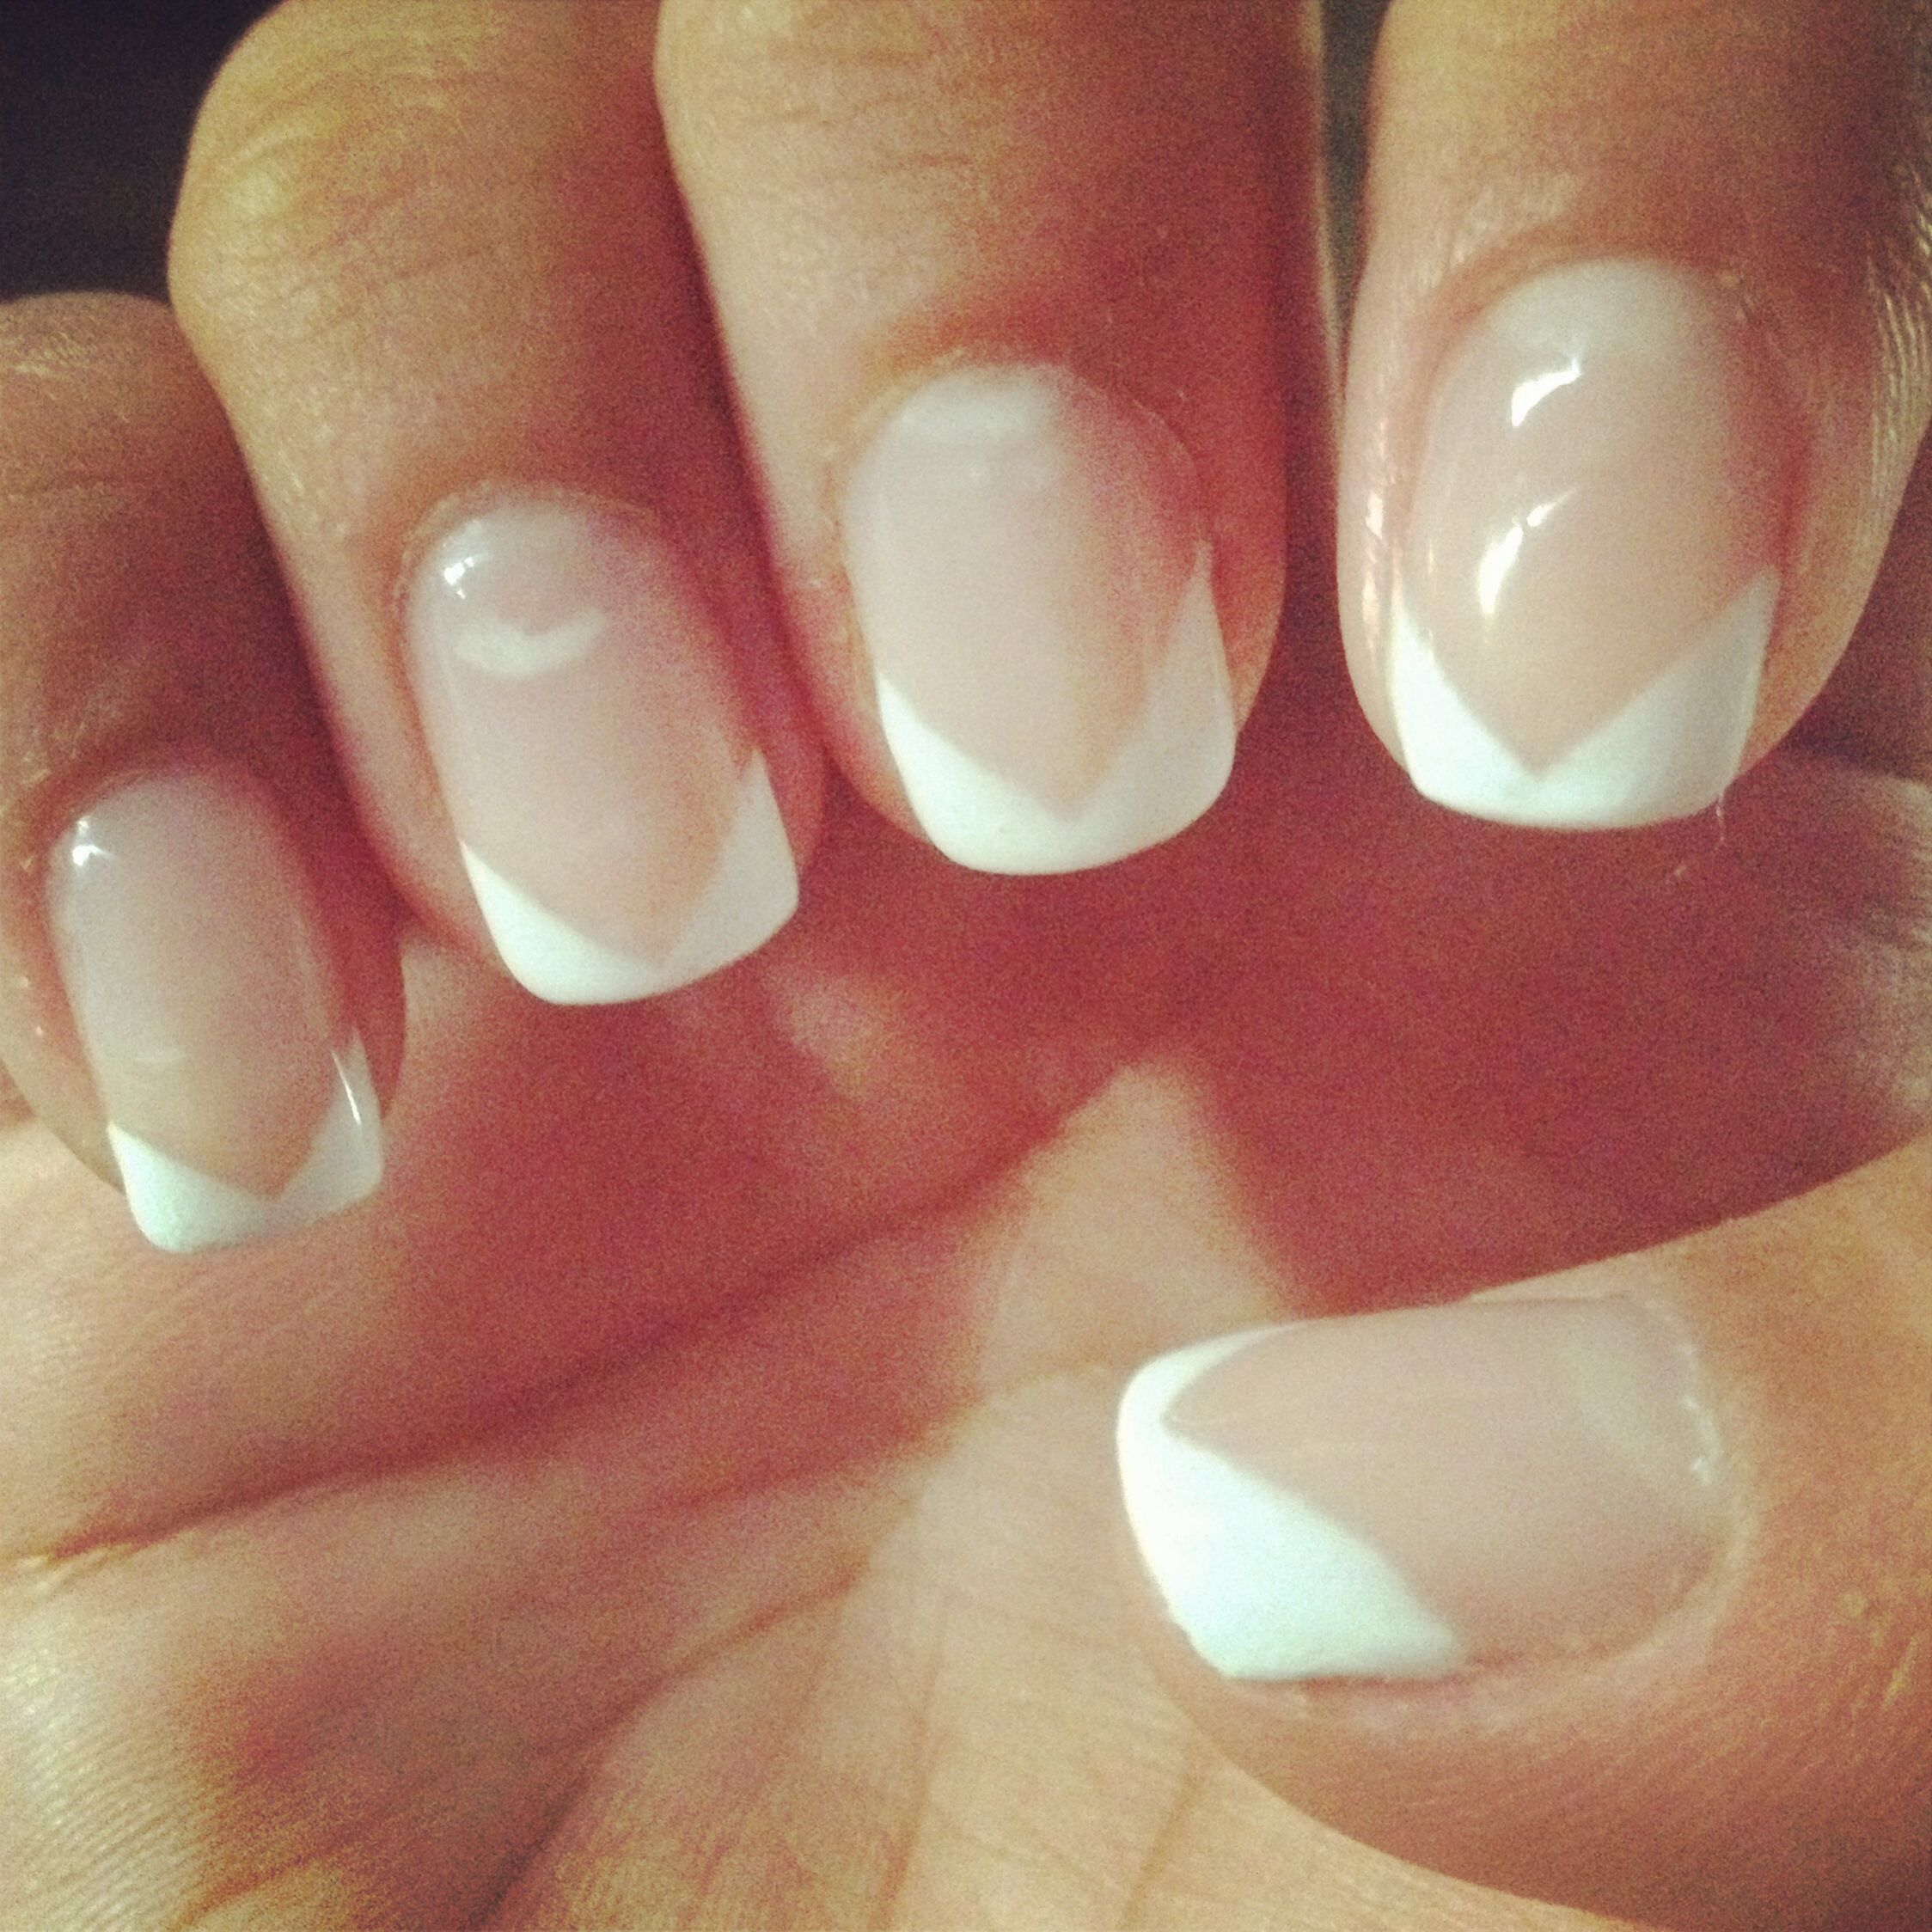 Gel Manicure V Shape French French Manicure Nail Designs Manicure Nail Designs Gel Nail Art Designs